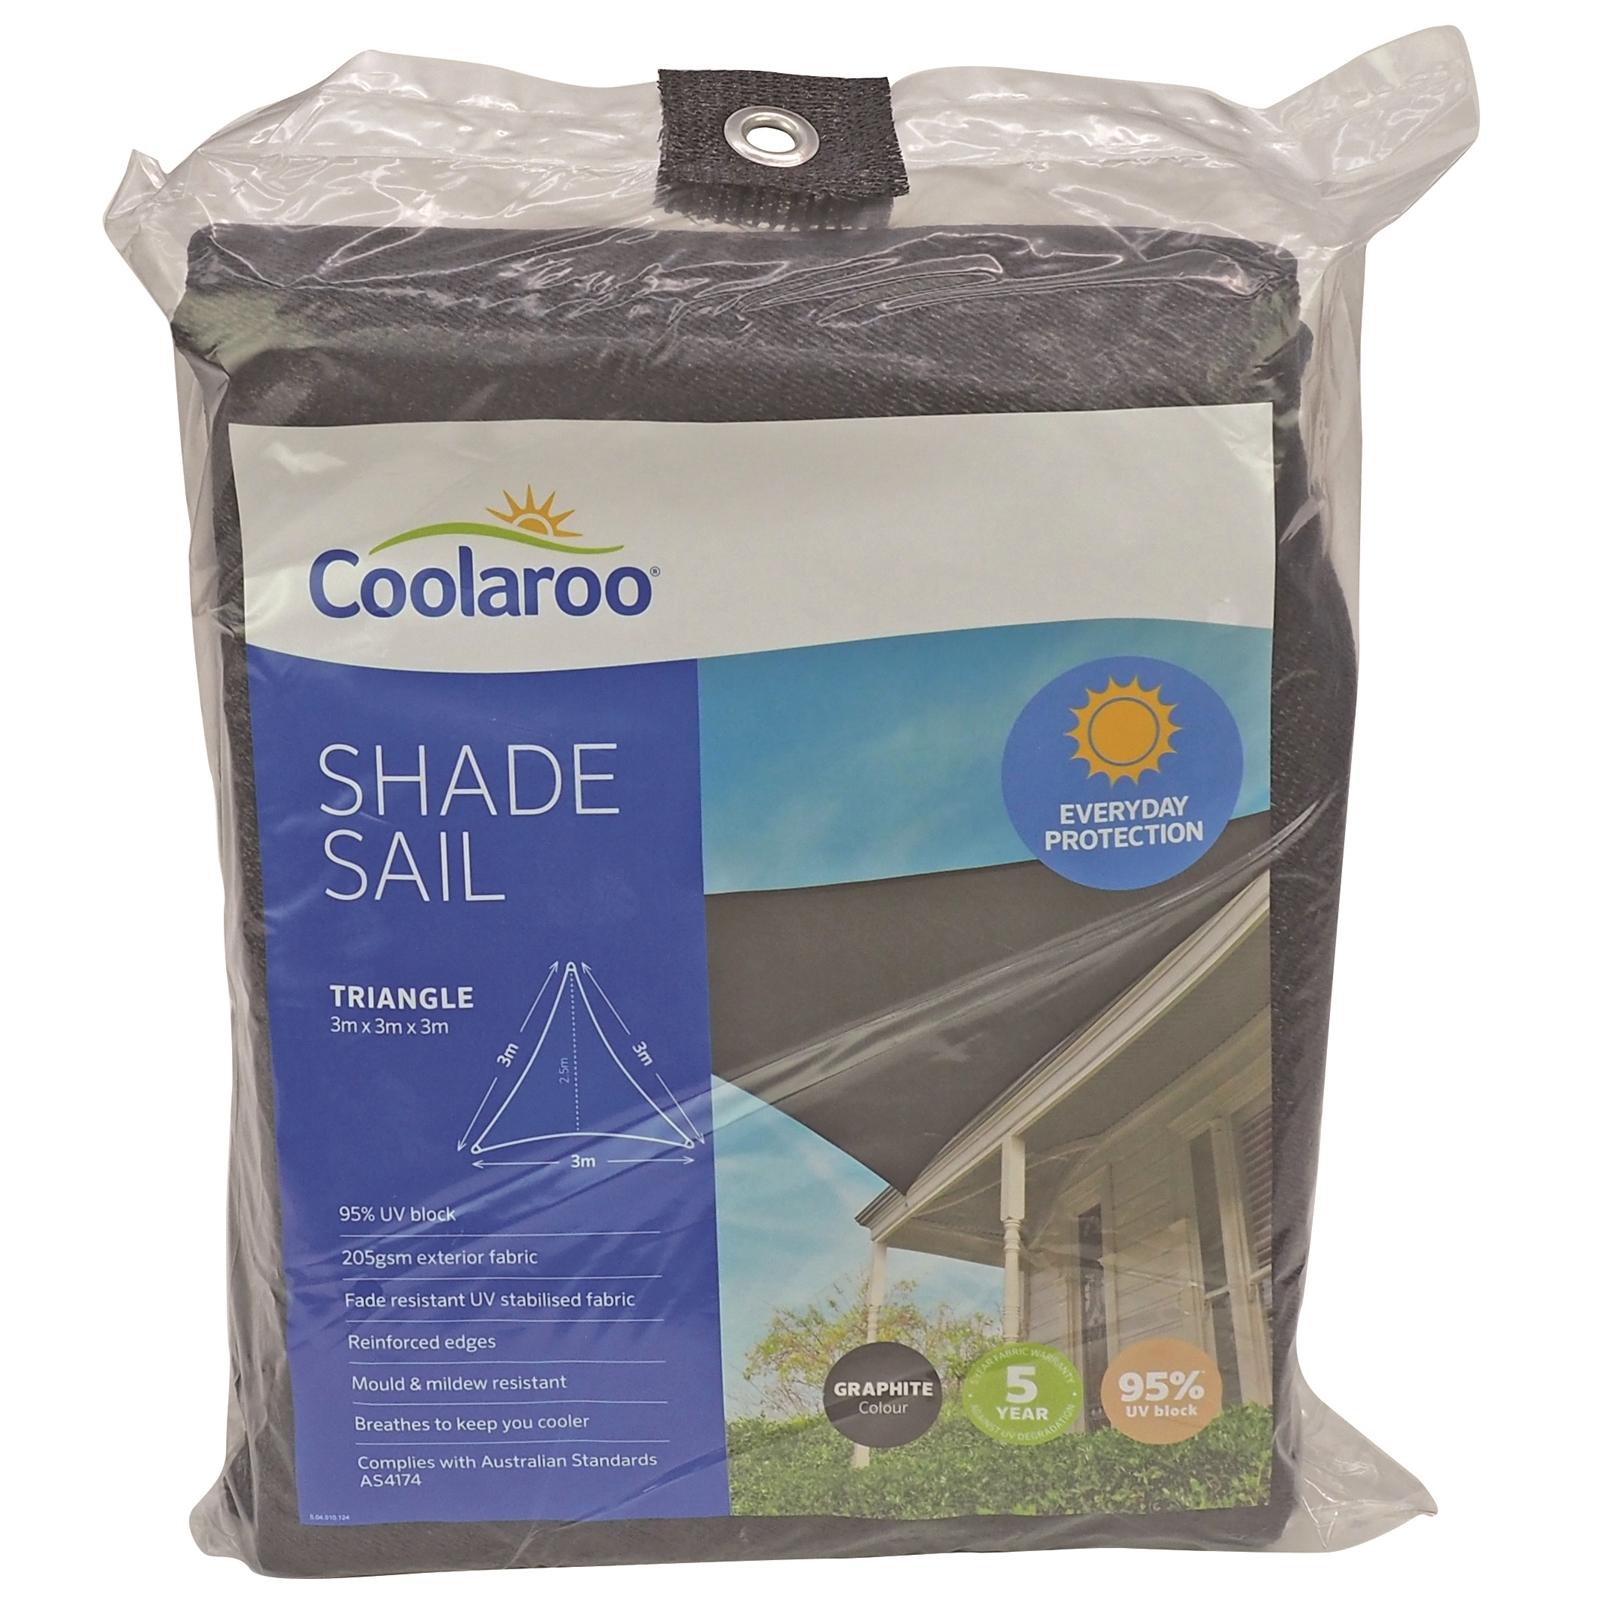 Coolaroo 3.0m Triangle Graphite Shade Sail